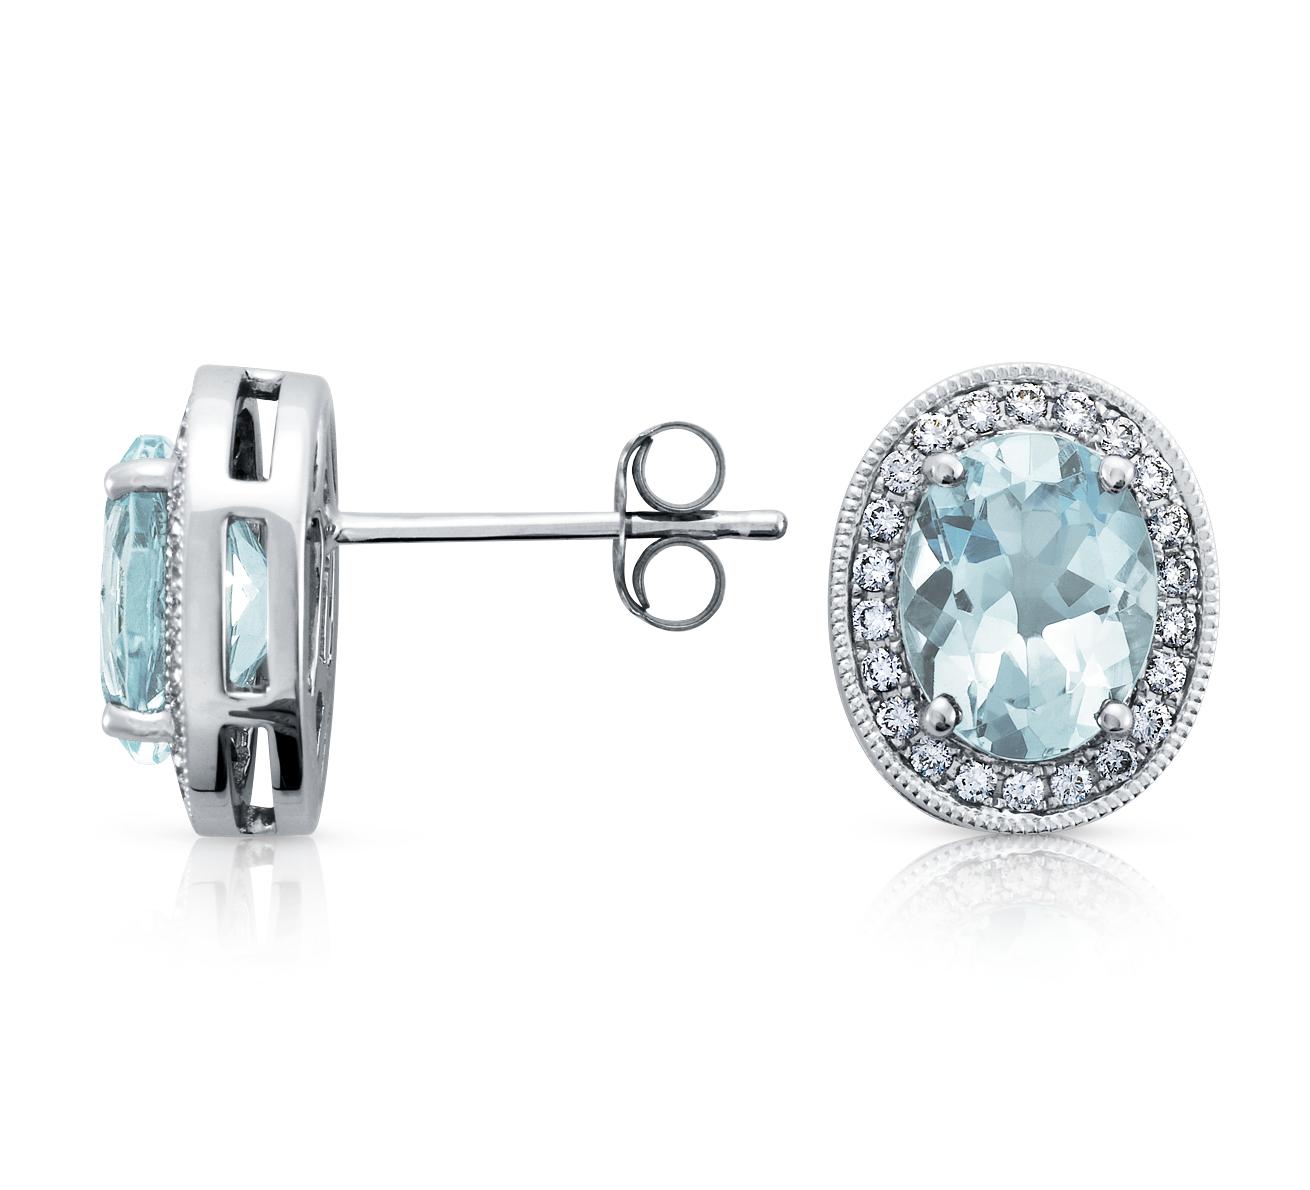 Aquamarine and Diamond Earring in 18k White Gold (8x6mm)